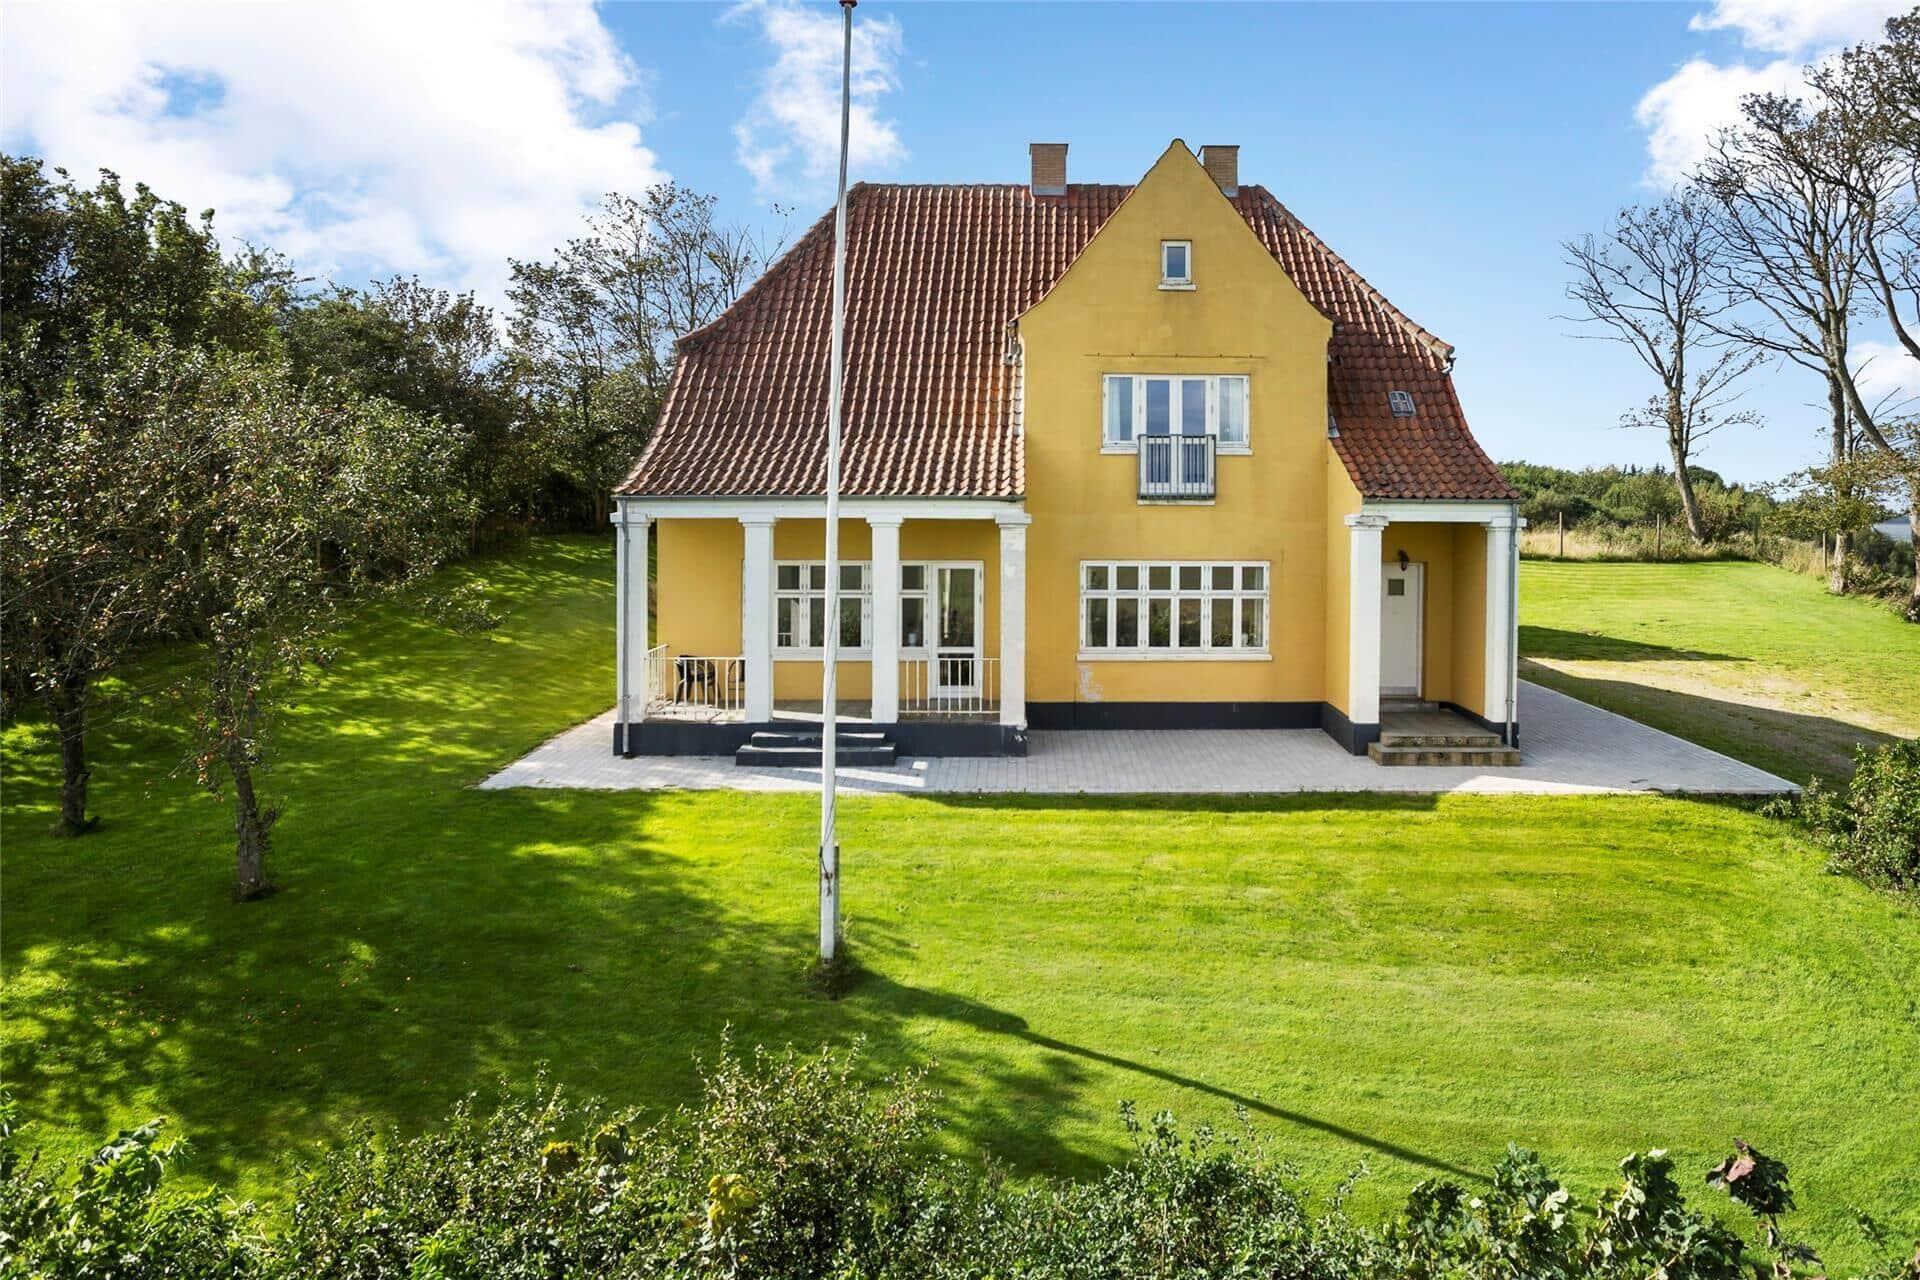 Bild 1-3 Ferienhaus L13111, Skarrehagevej 11, DK - 7900 Nykøbing M